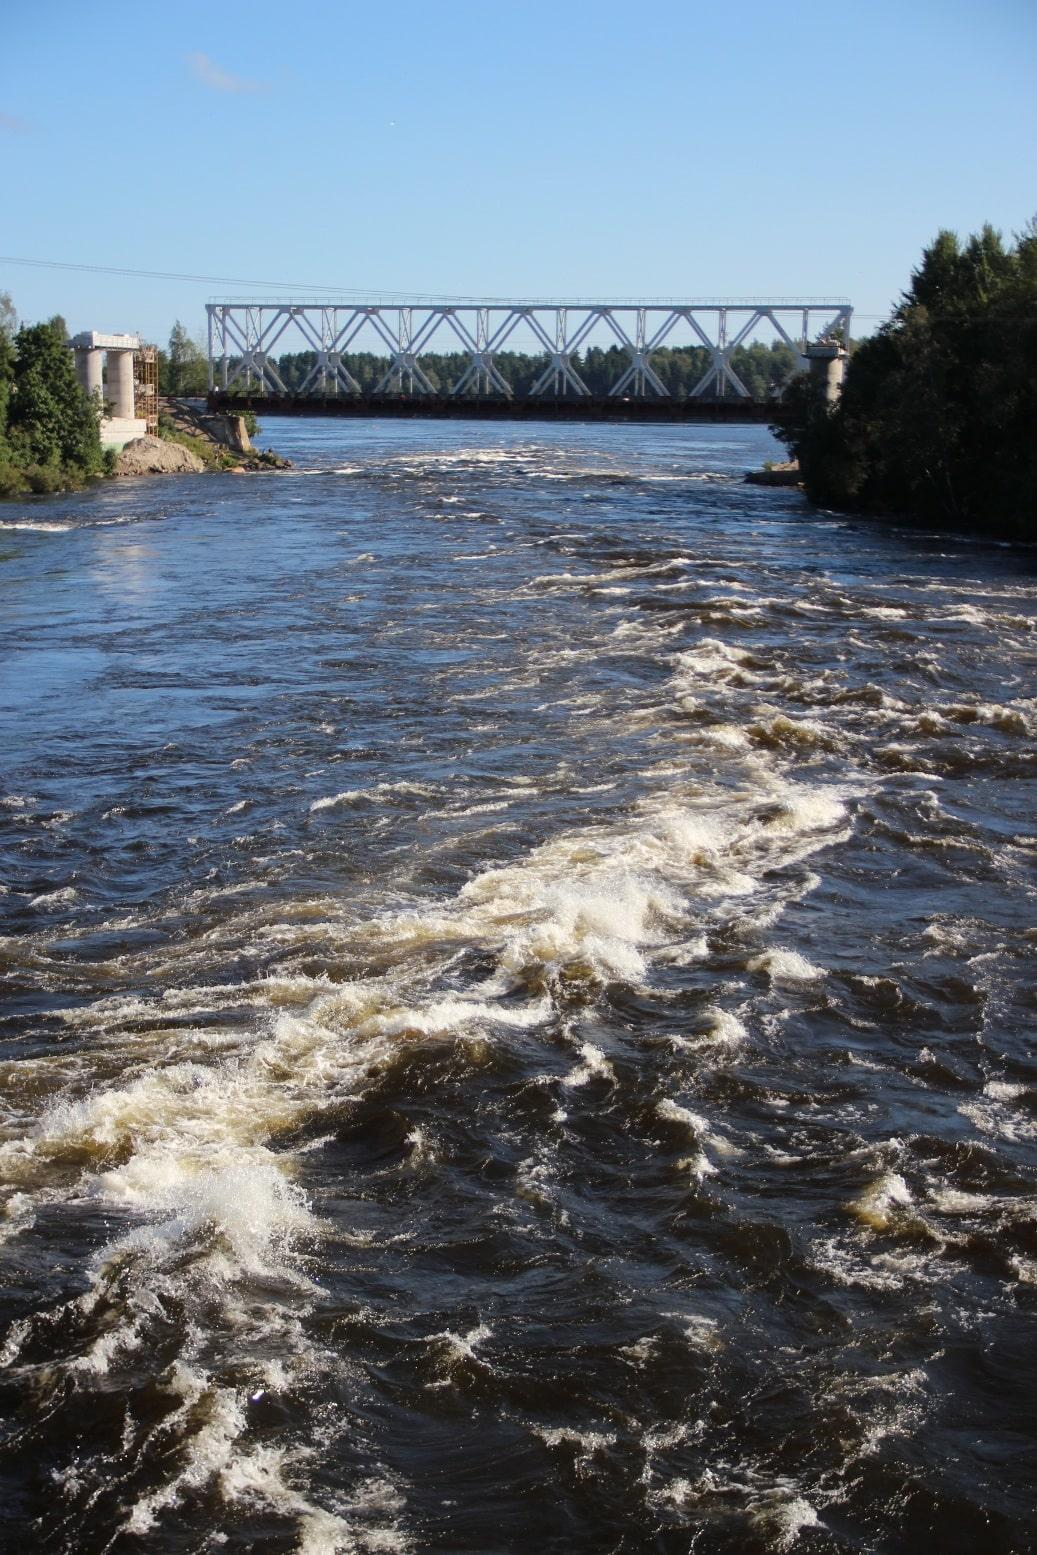 Глубина протоки у ж/д моста достигает 17 м